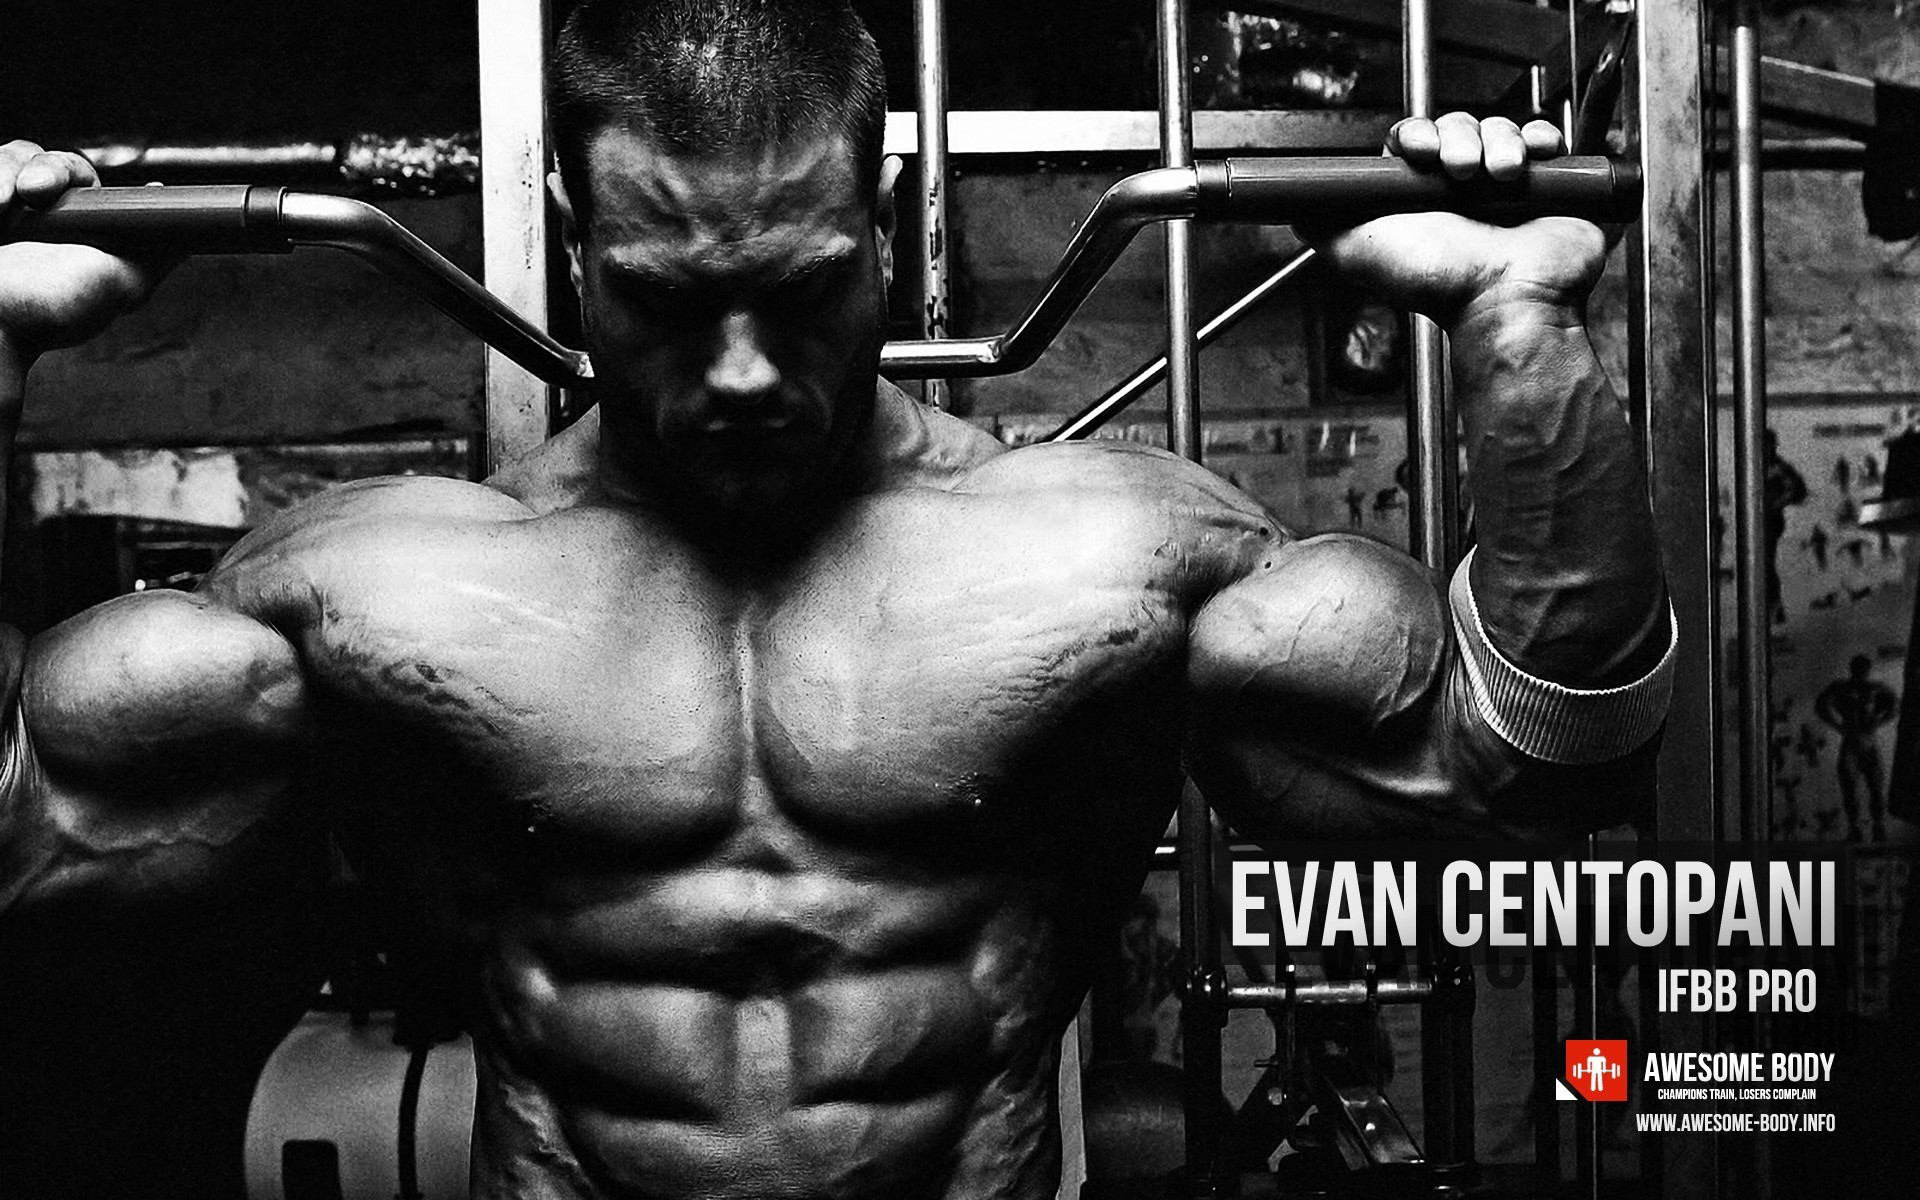 Monstrous Male Bodybuilder Wallpapers Blaberize 1920×1080 Wallpapers  Bodybuilding (58 Wallpapers) | Adorable